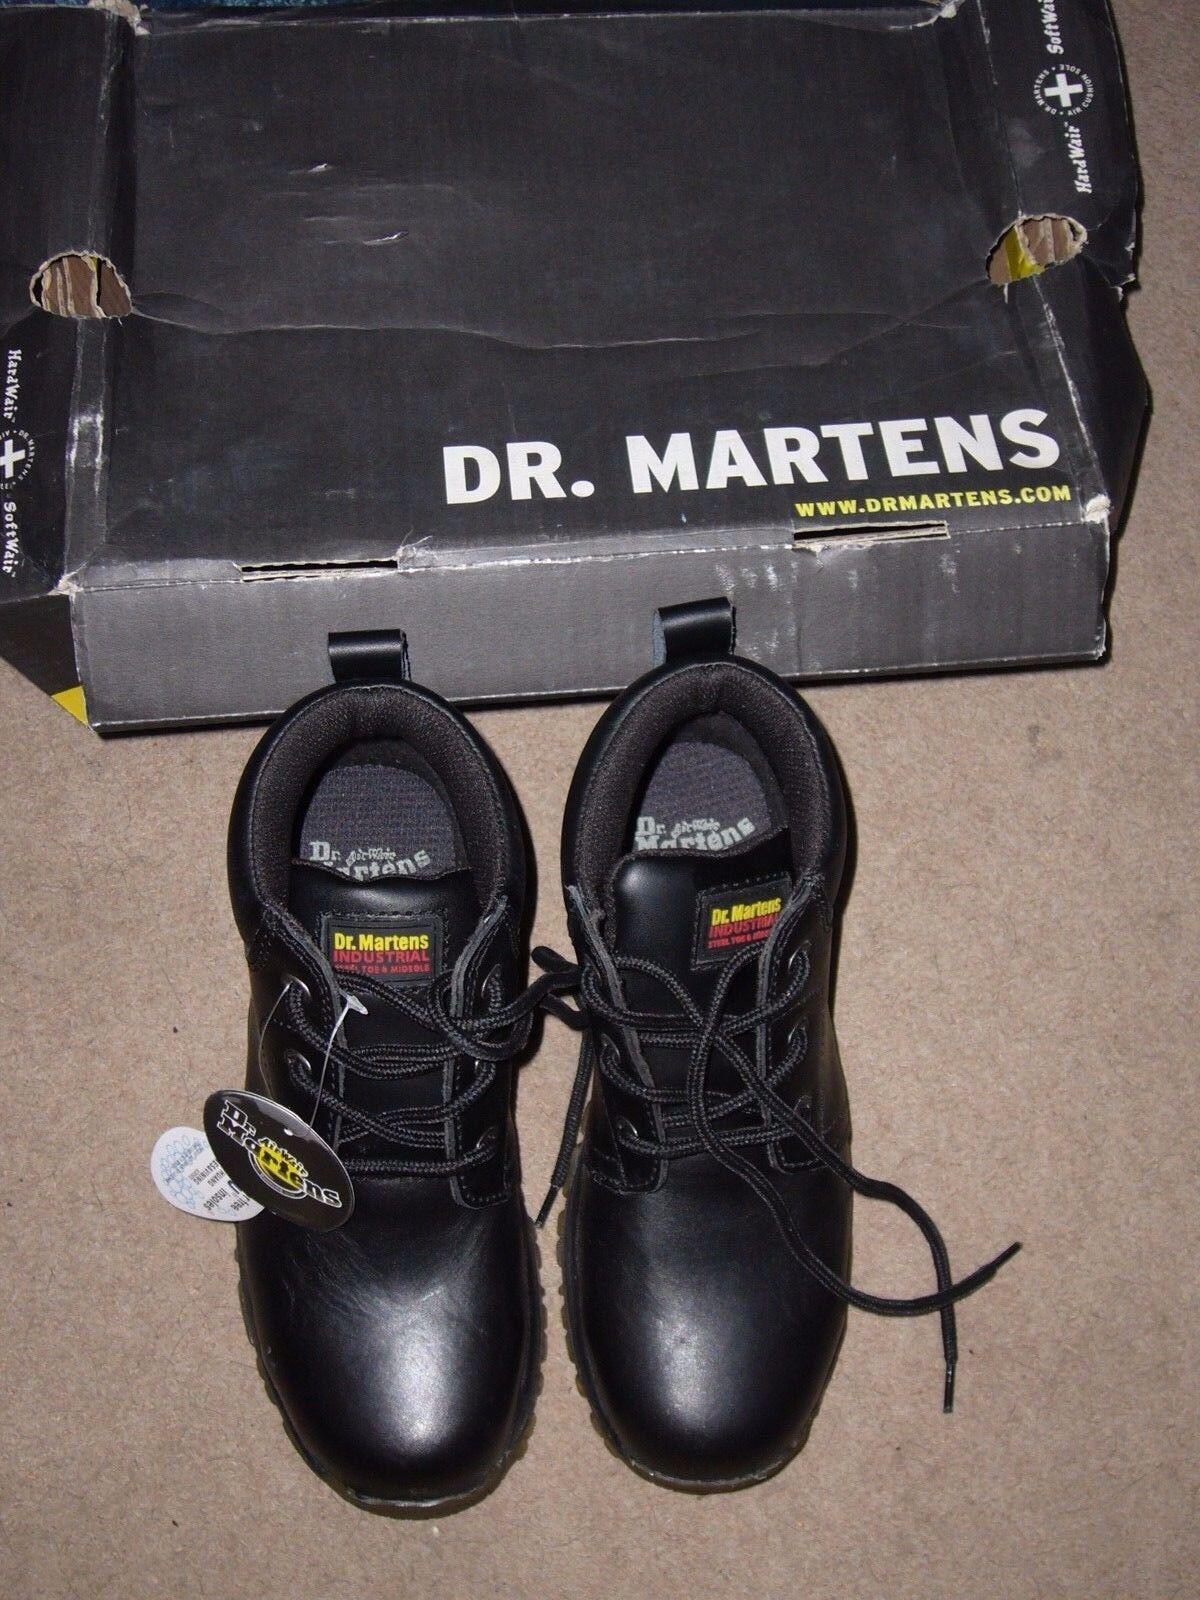 DR MARTENS WORK WORK MARTENS 0028 BLACK LEATHER INDUSTRIAL Stiefel Damenschuhe STEEL MIDSOLE & TOE 97d34f